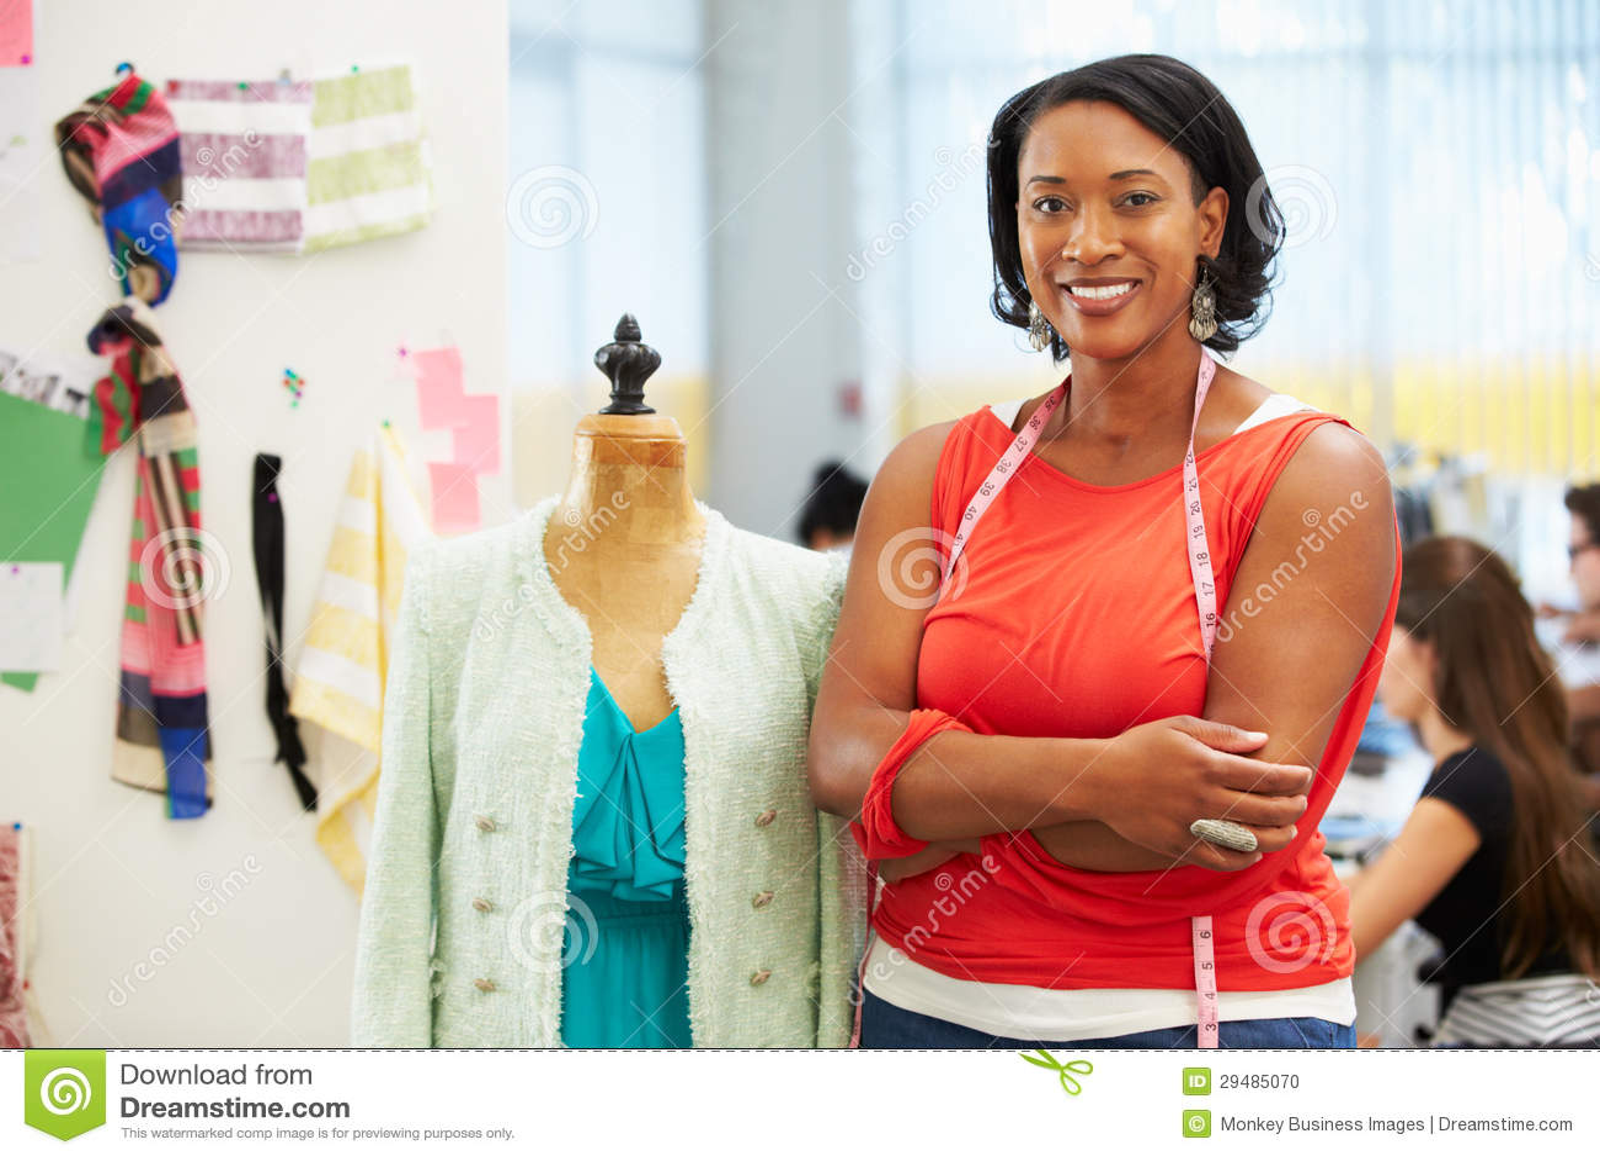 Fashion Designer Design Shopping Tour Dress Code Cartoon Vector 52461101